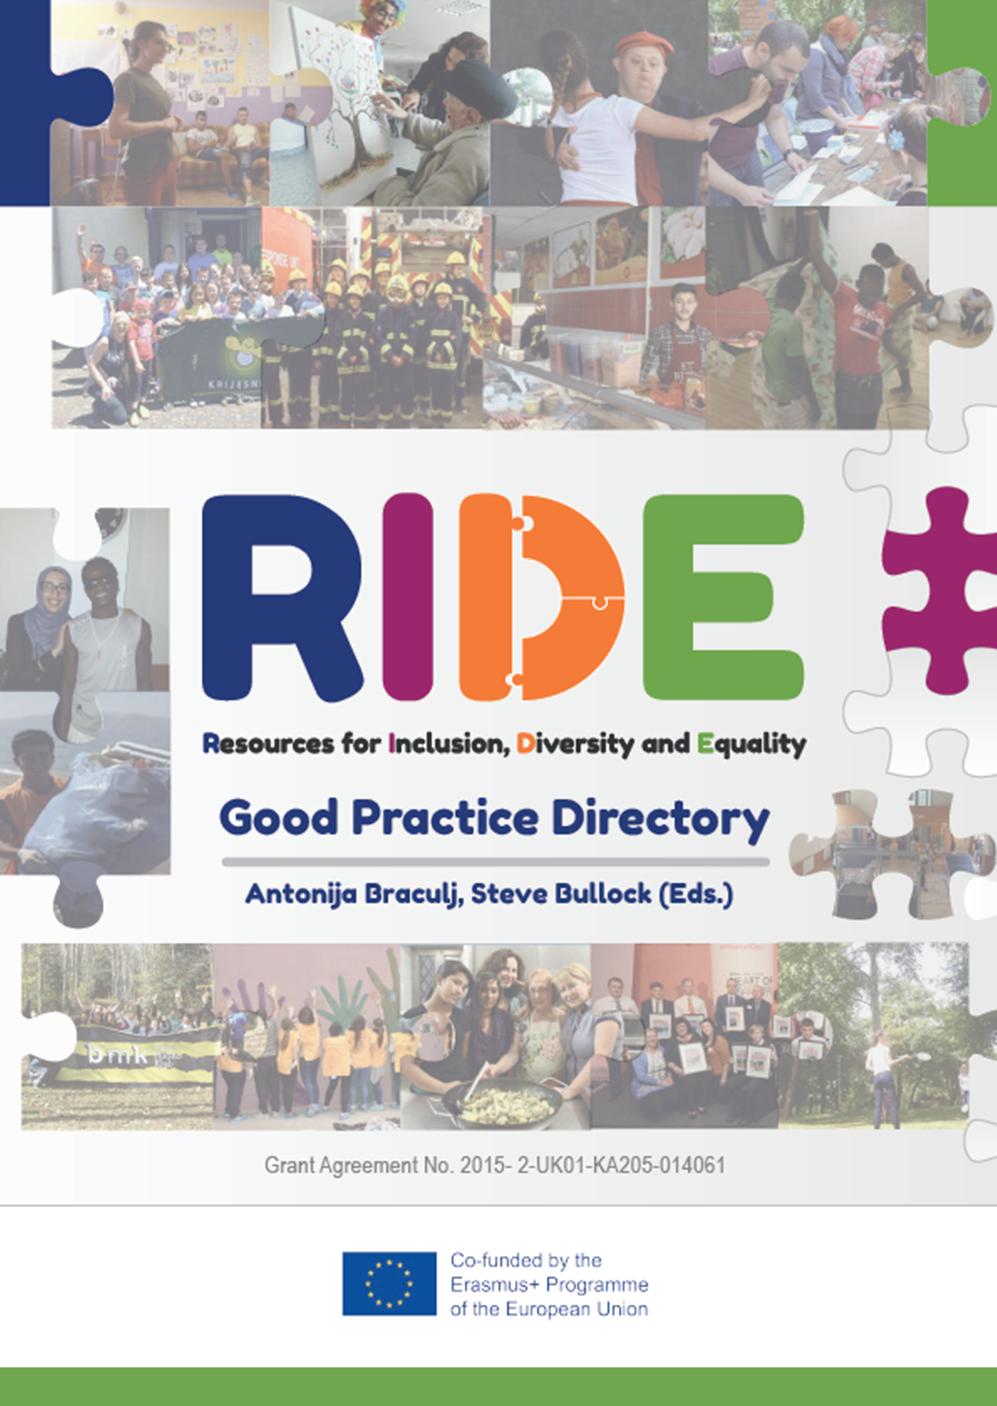 RIDE - Good Practice Directory